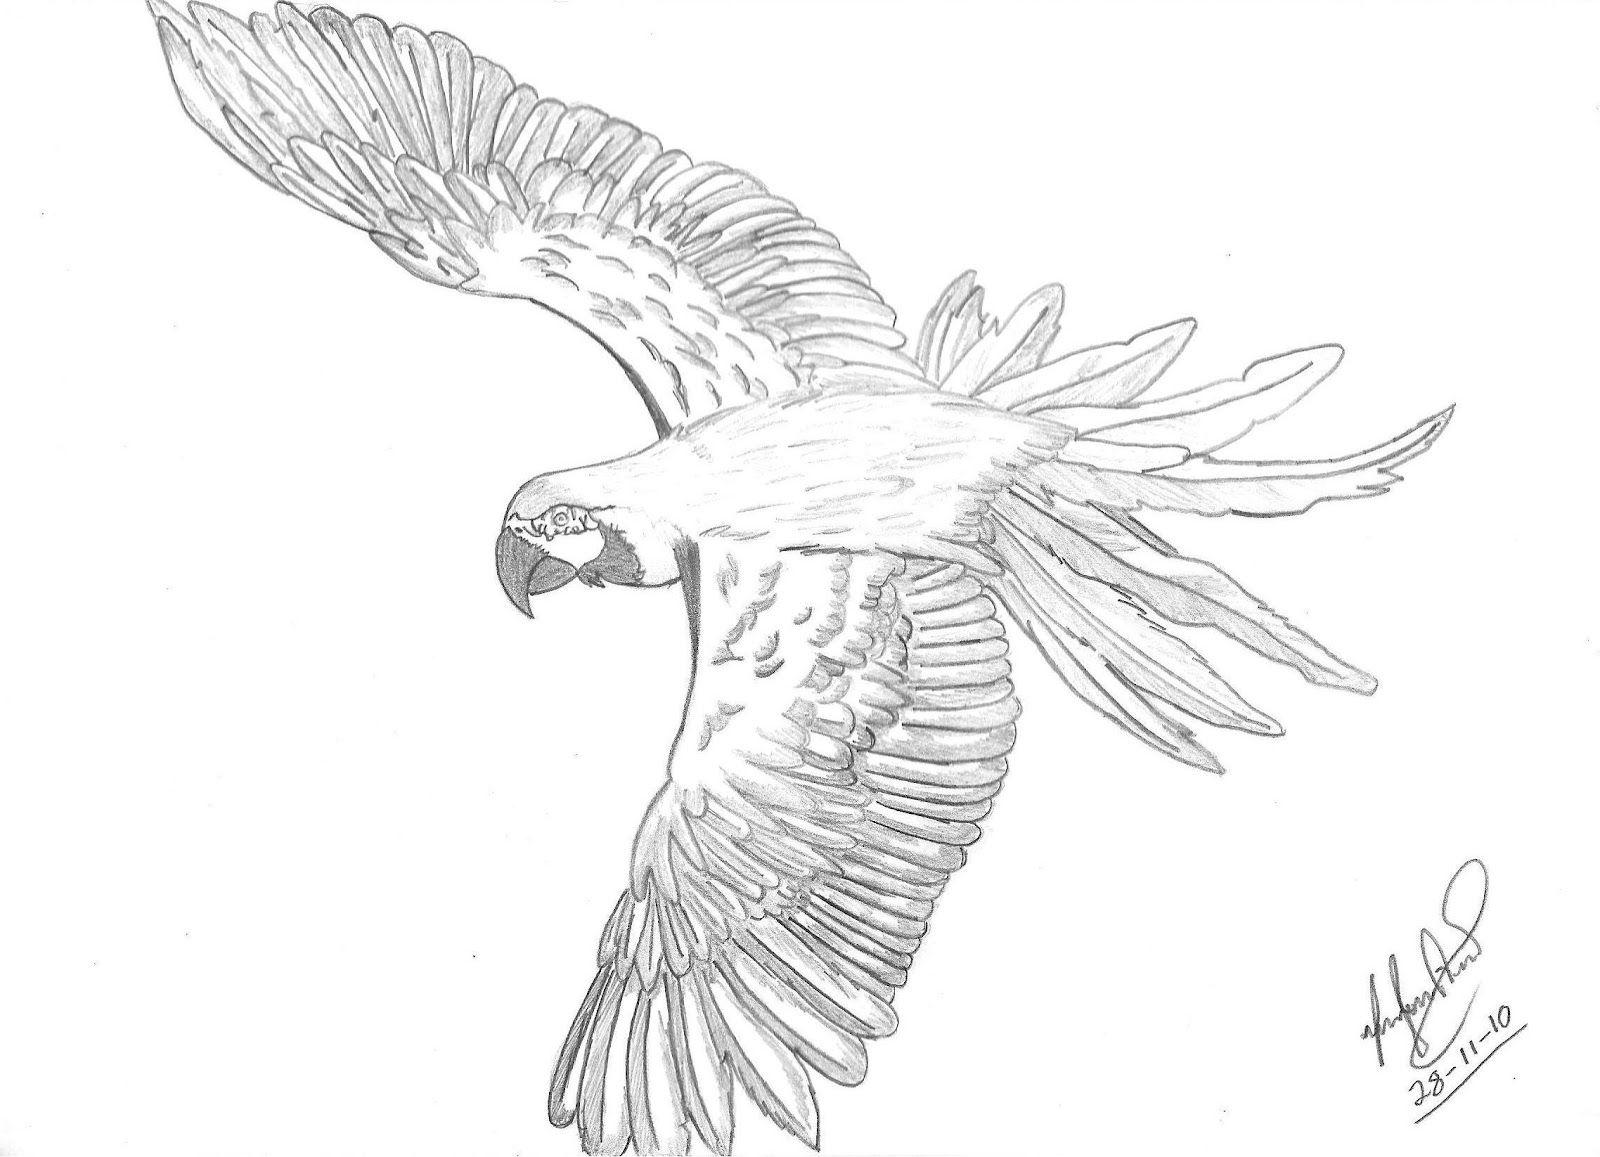 Fabuloso araras desenho - Pesquisa Google | araras e passaros | Pinterest  AT46